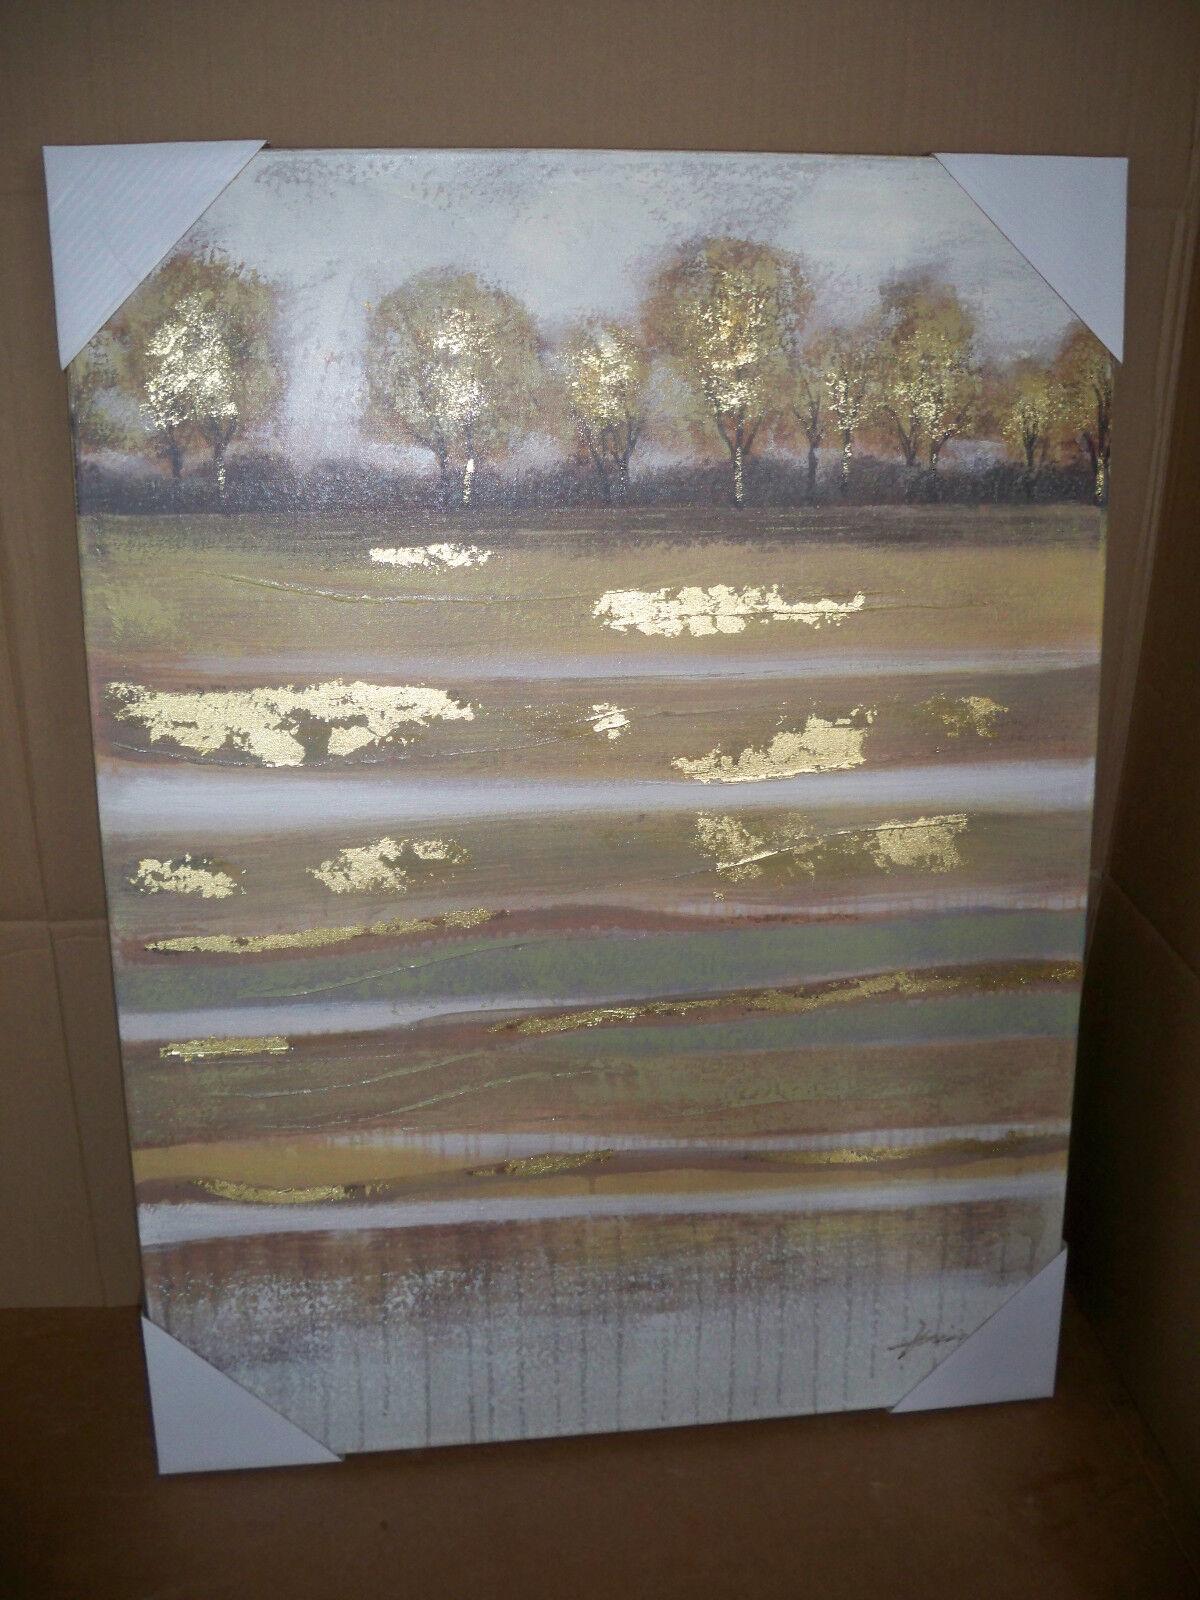 Bild Idille  handgemalt  auf Leinwand UNIKAT 100x 75 cm